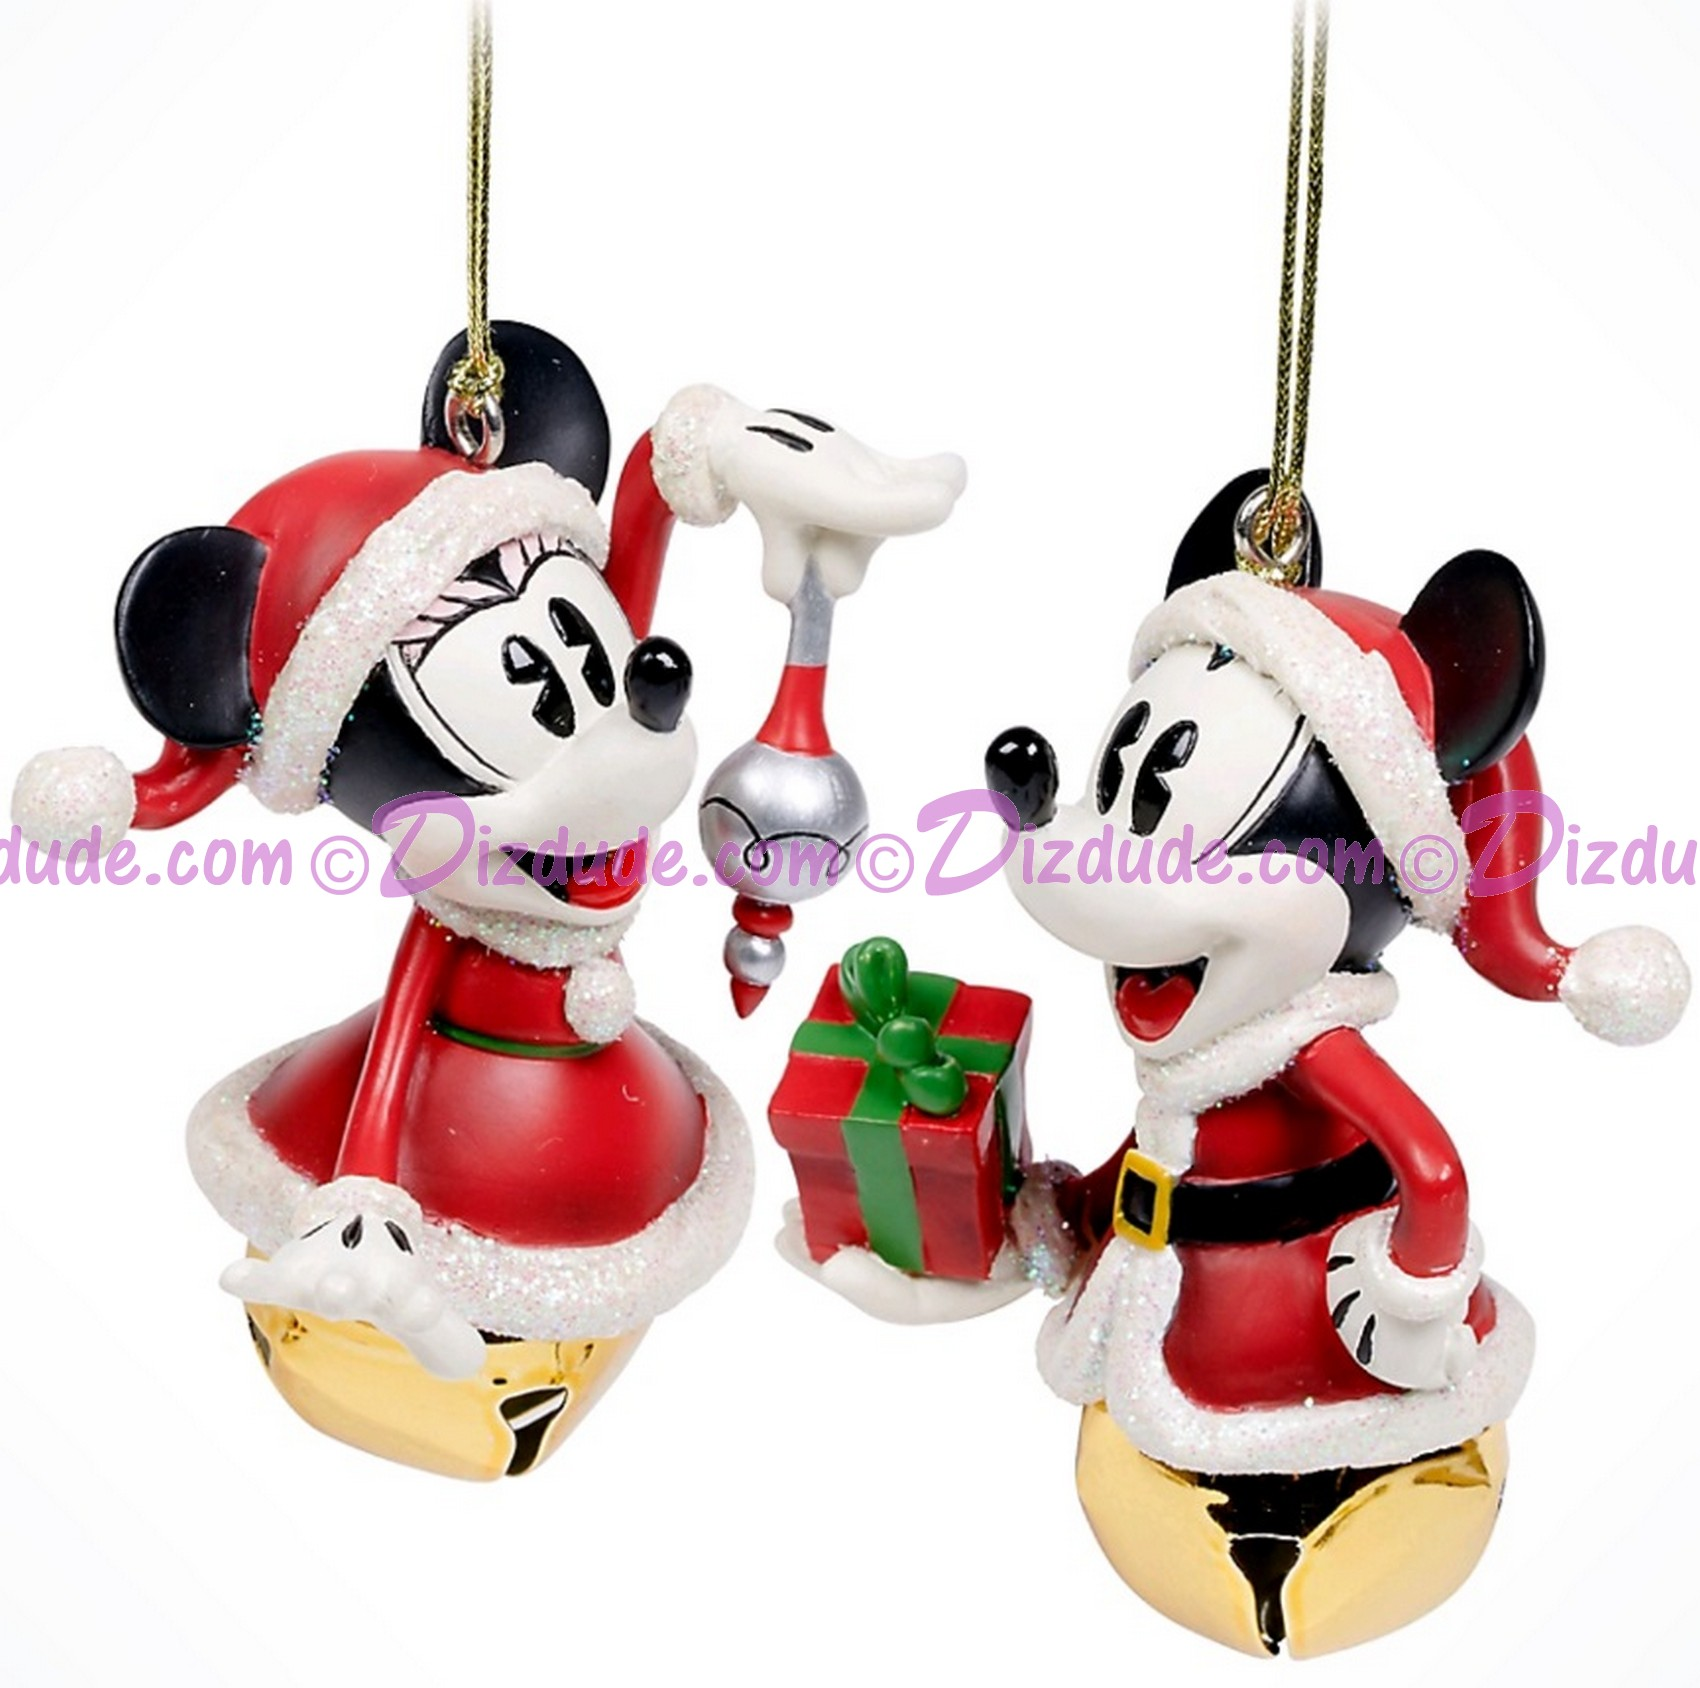 Disney Turn of the Century Mickey and Minnie Bell Set Christmas Ornaments © Dizdude.com